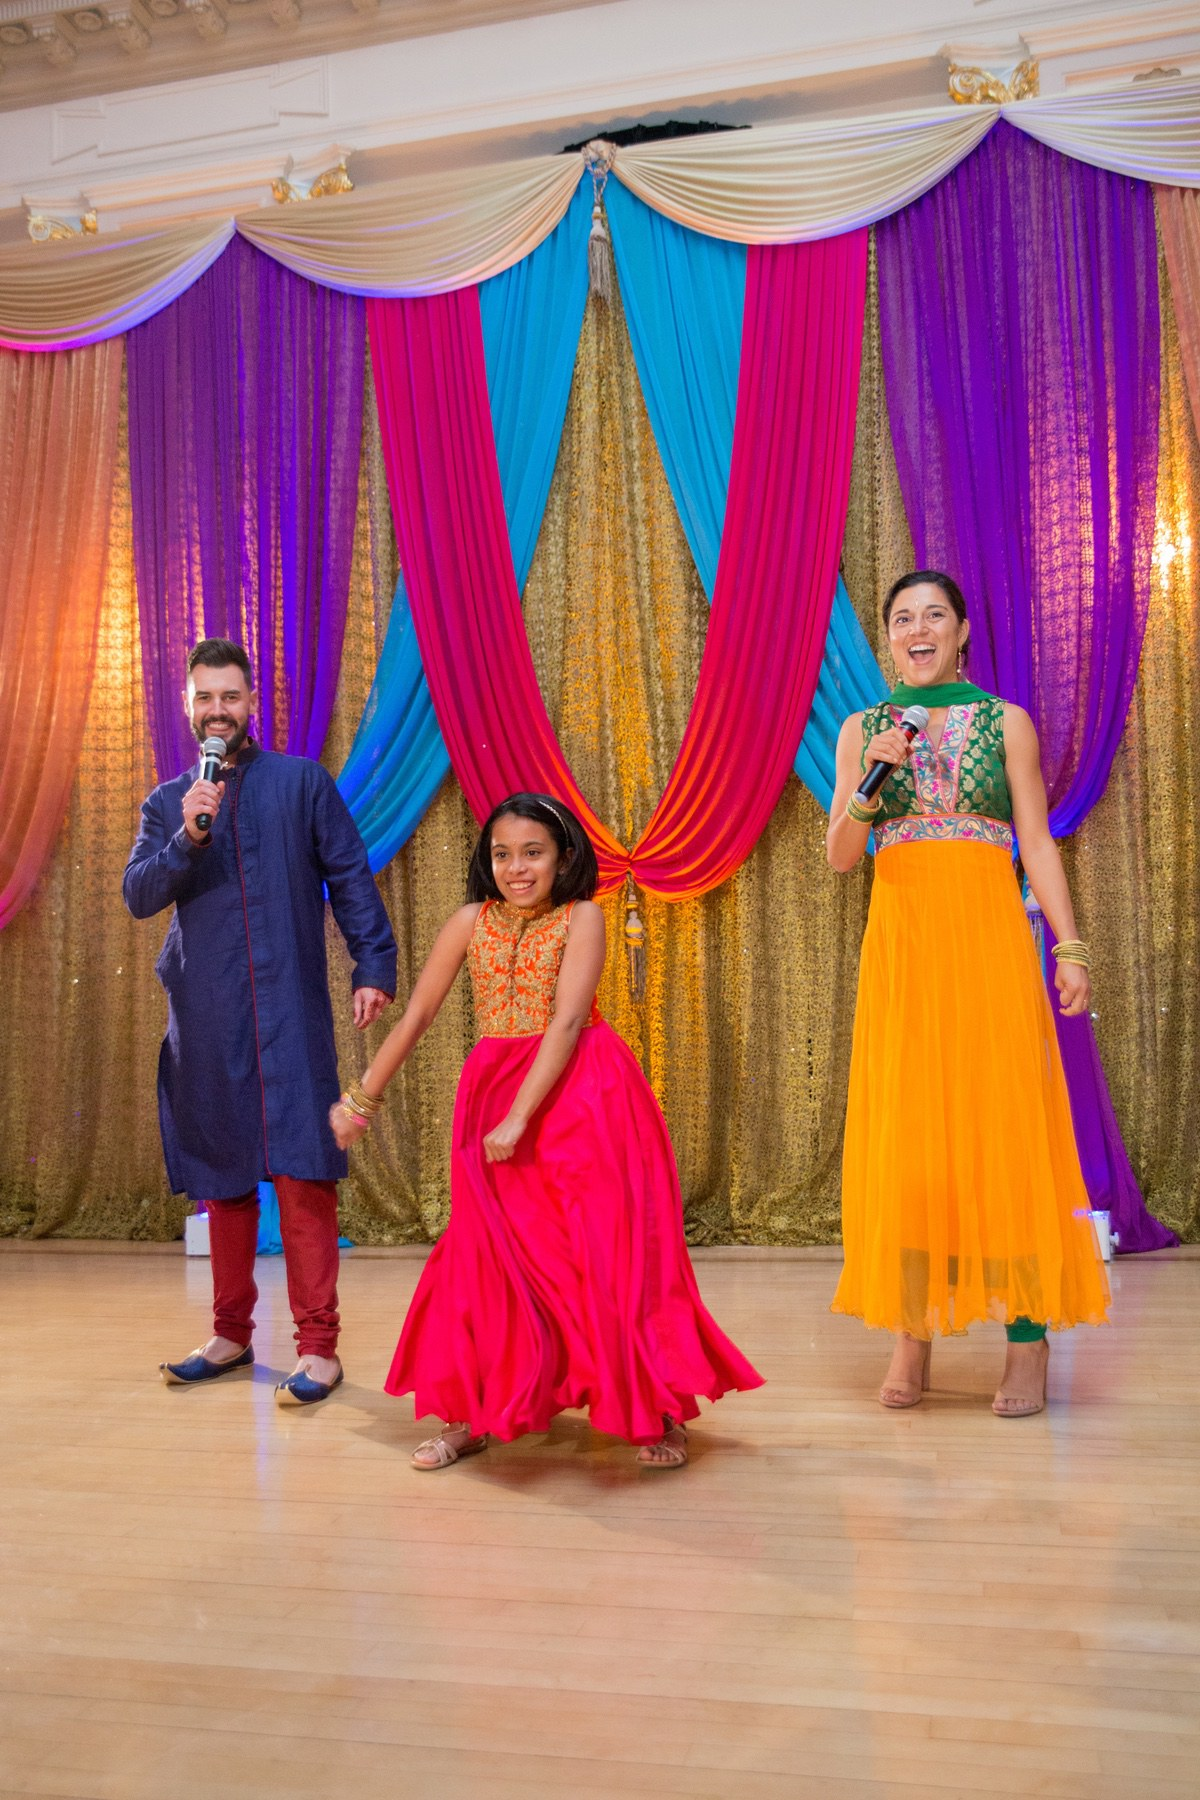 Le Cape Weddings - South Asian Wedding - Trisha and Jordan - Sangeet -166.jpg